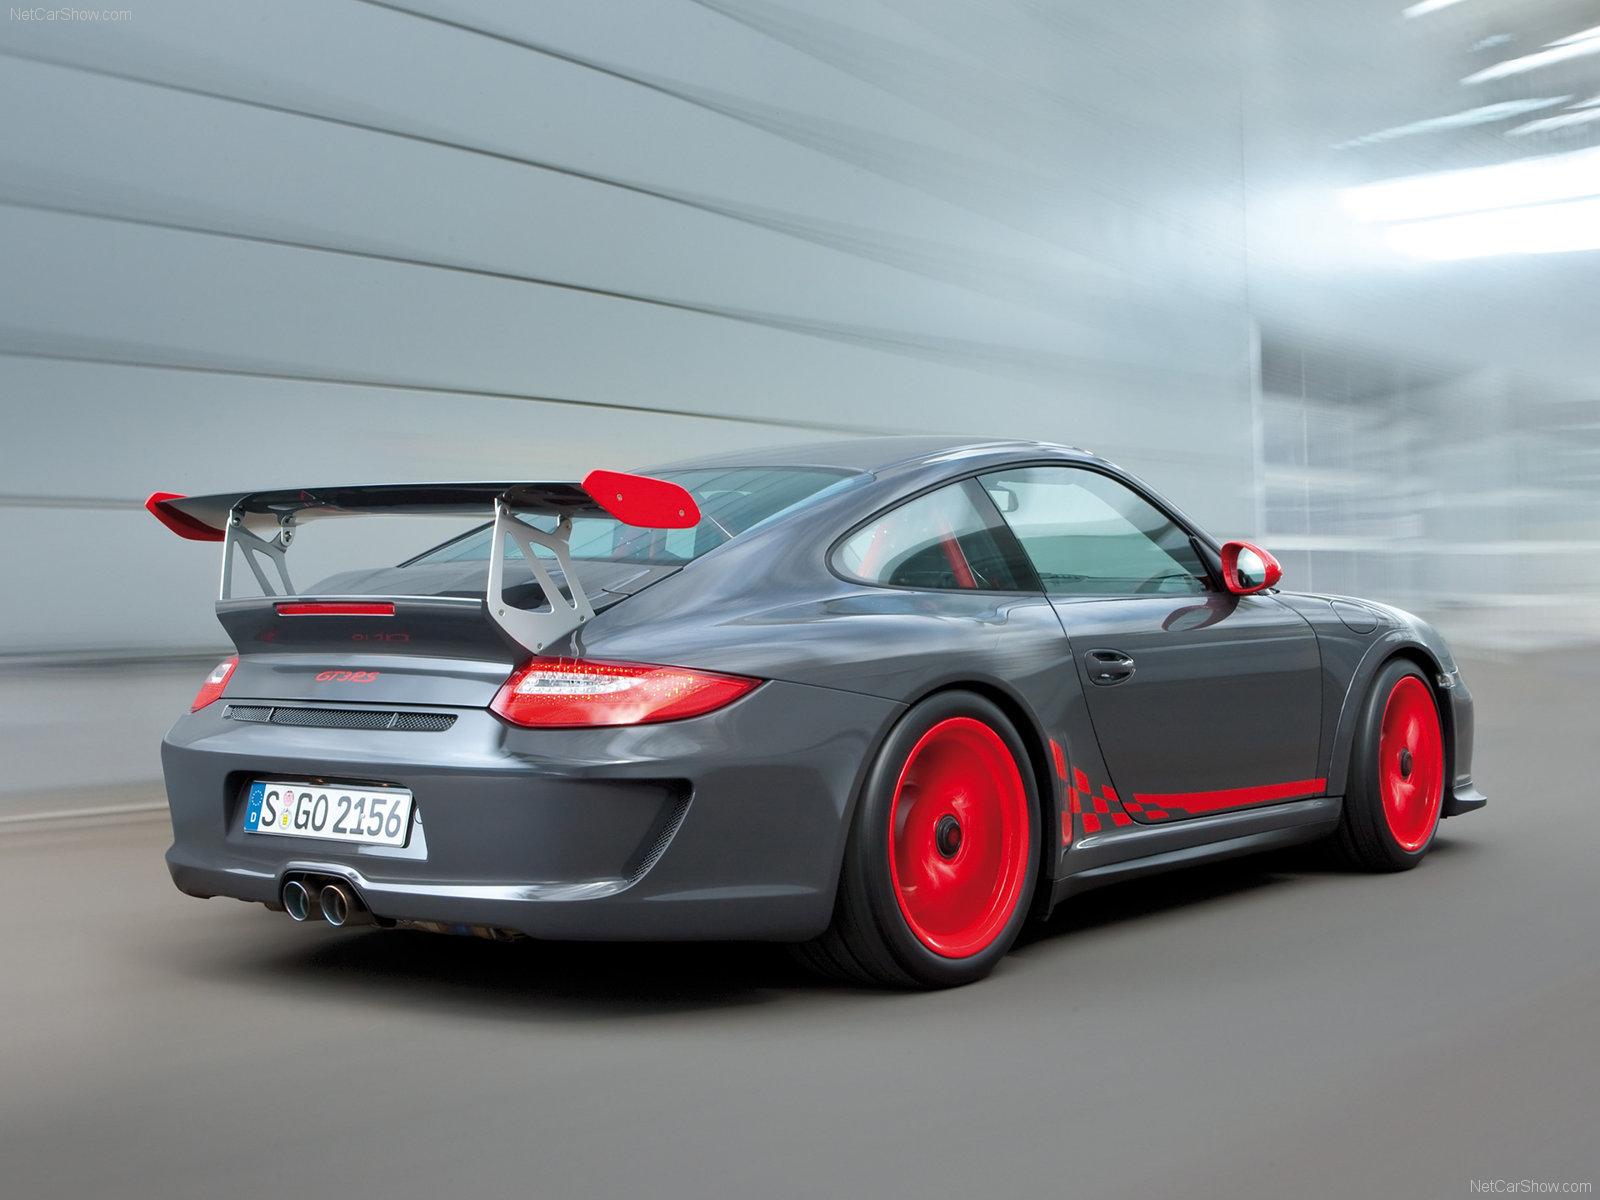 Used Porsche Sale